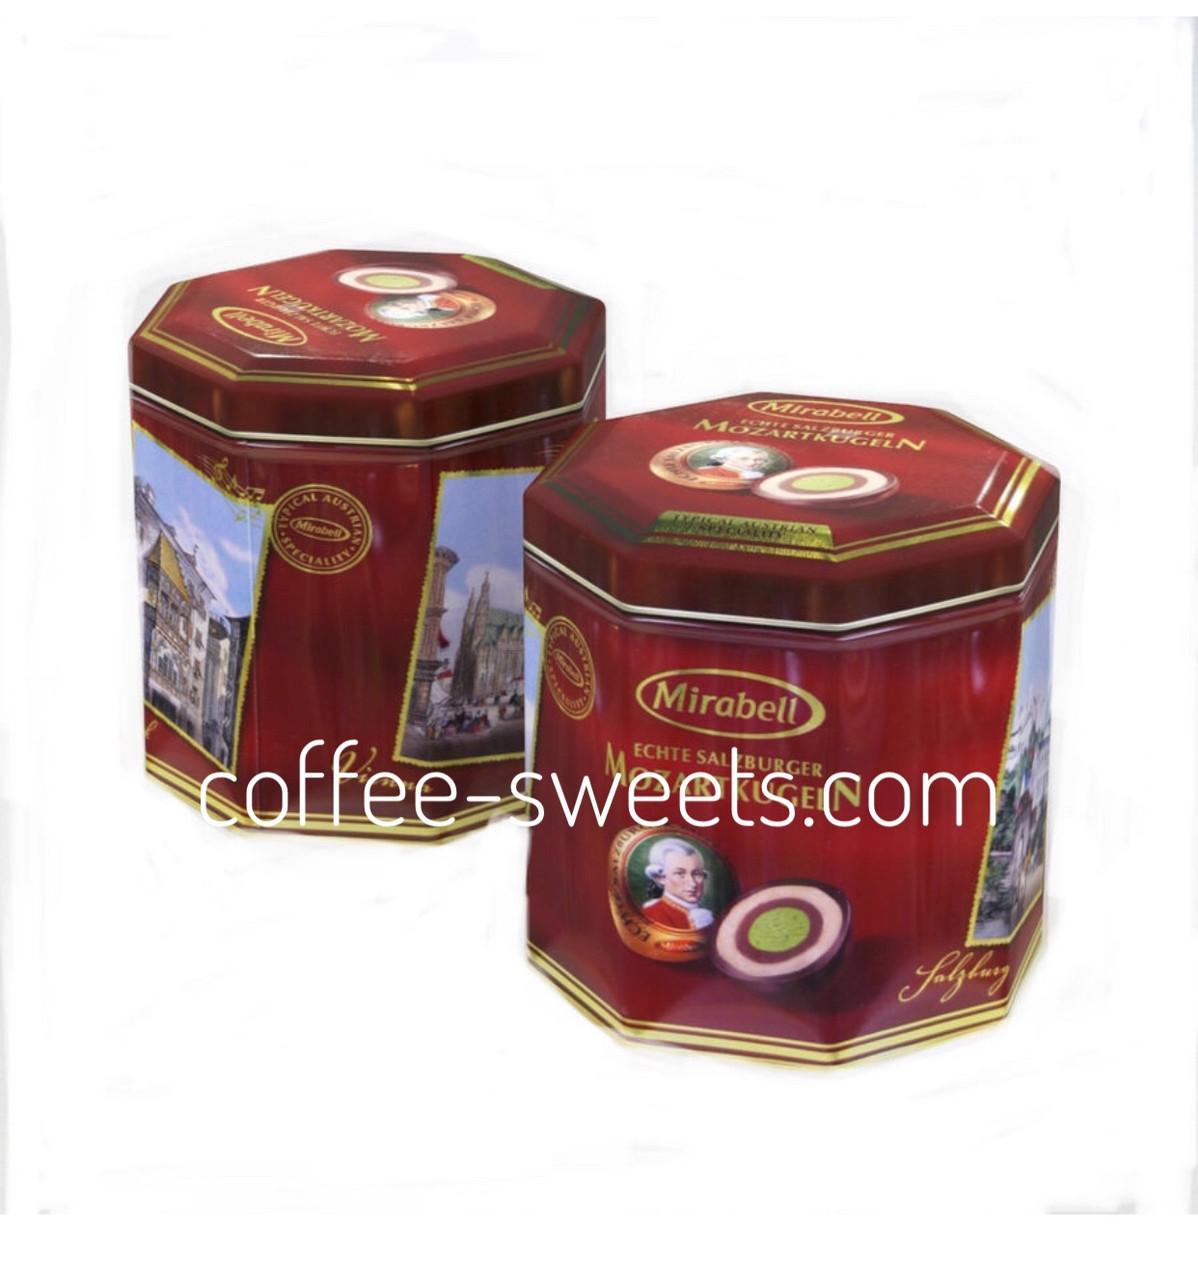 Конфеты шоколадные Mozart Kugeln Mirabell 500g